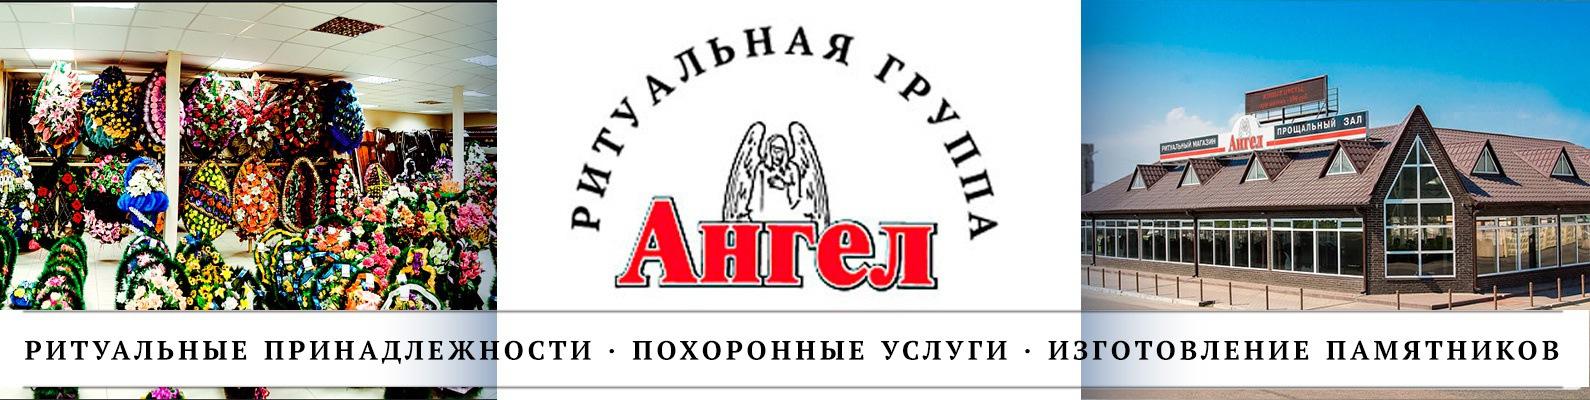 Брянск ангел памятники ангел памятники фото 9 кв